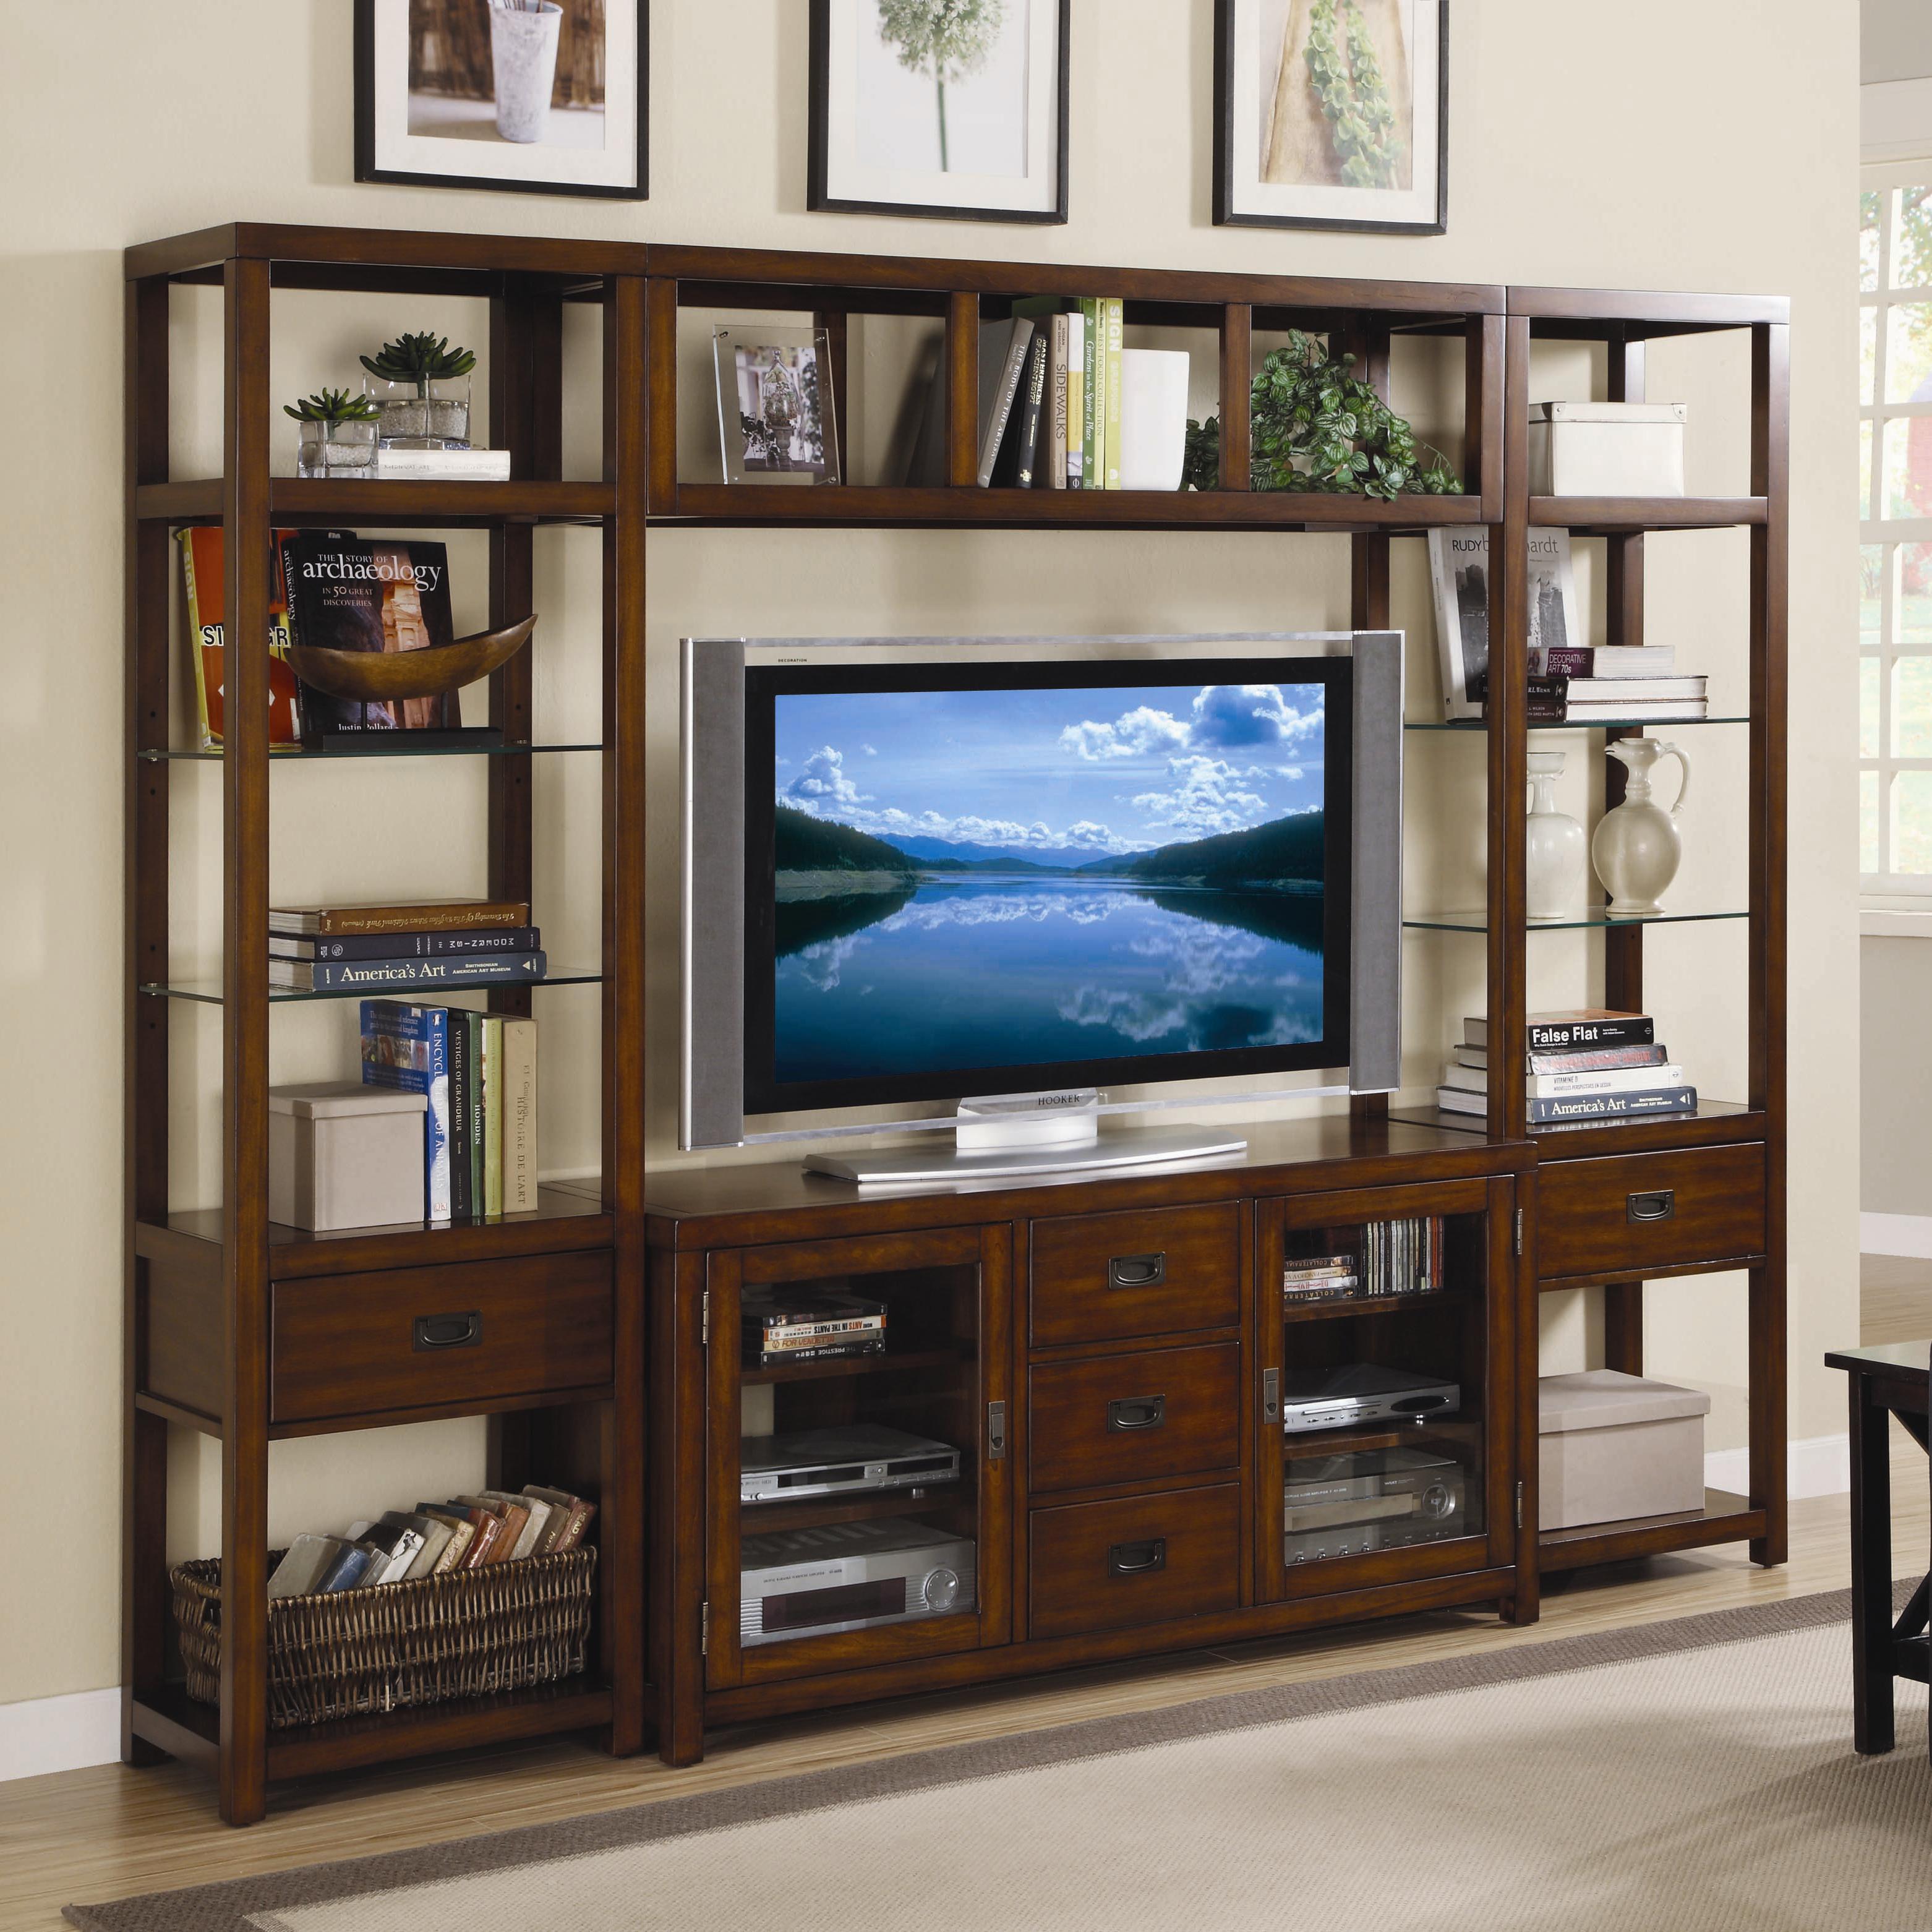 wall units hooker furniture danforth wall unit - item number: 388-70-641+2x450 VUAYCGP